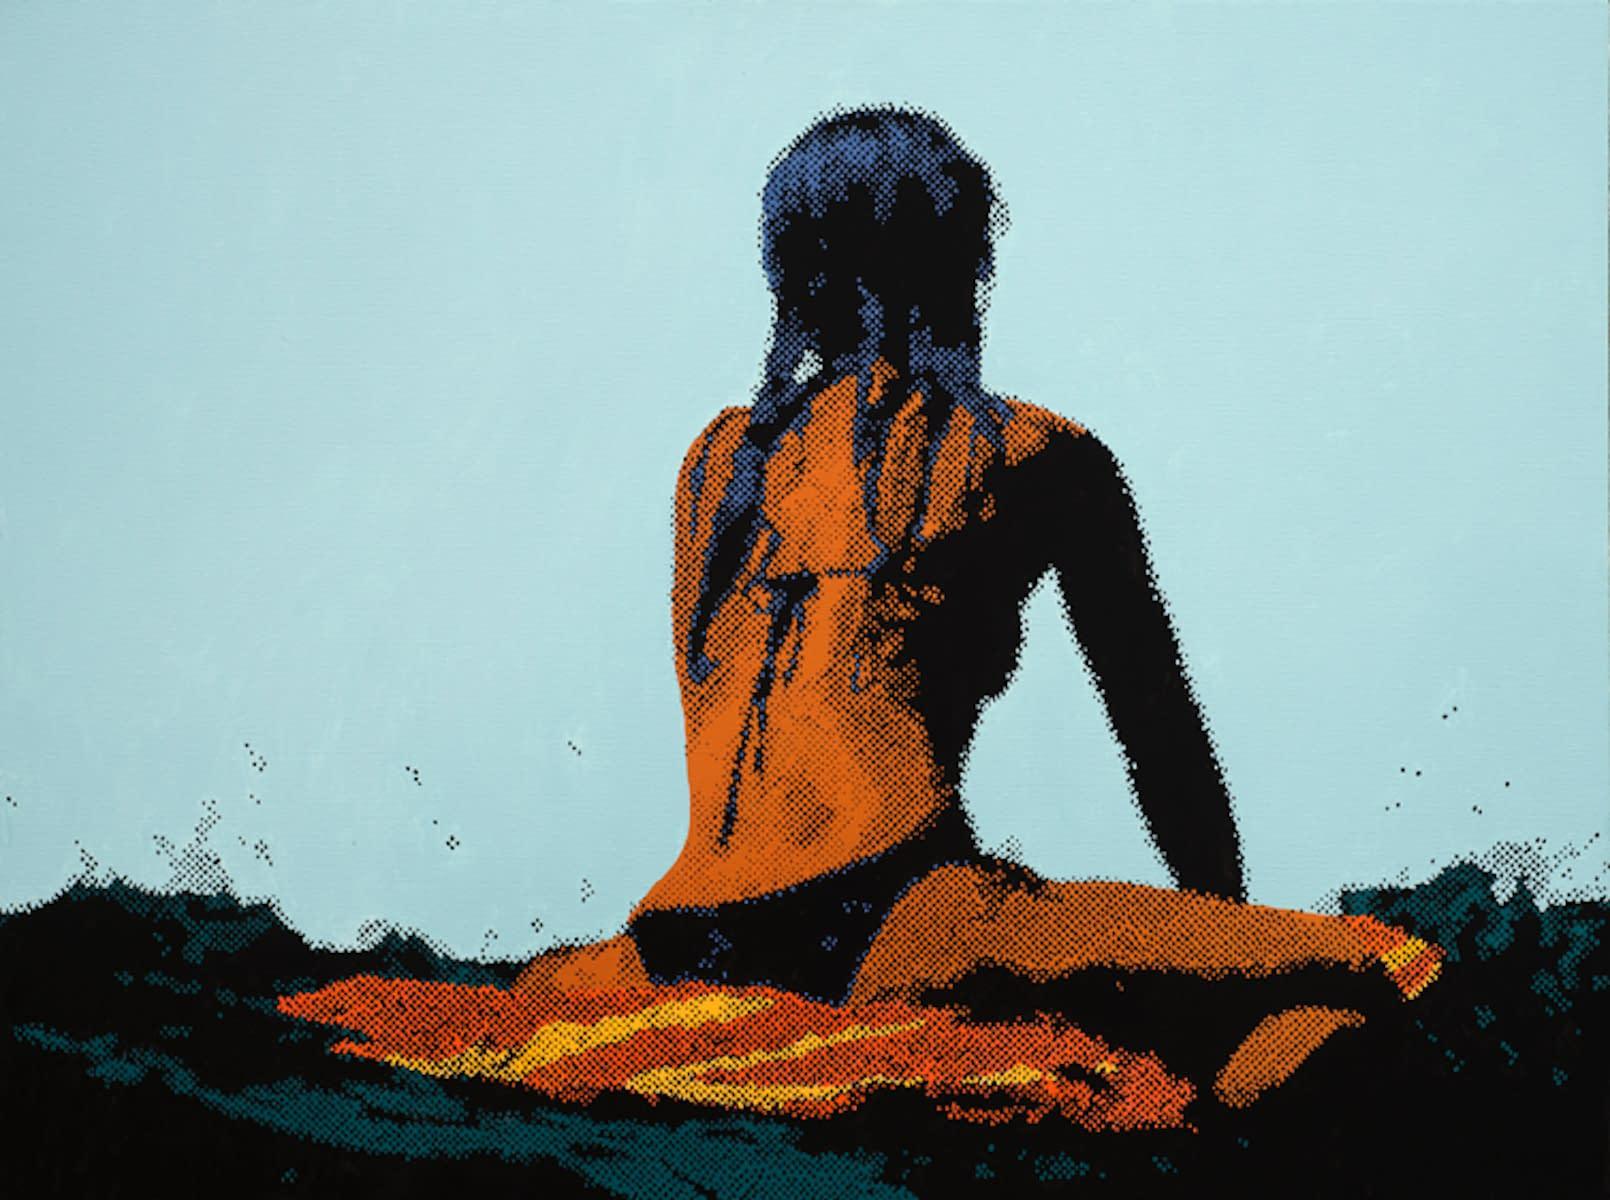 Surfer_Girl_I_oil_on_canvas_30_x_40_19000